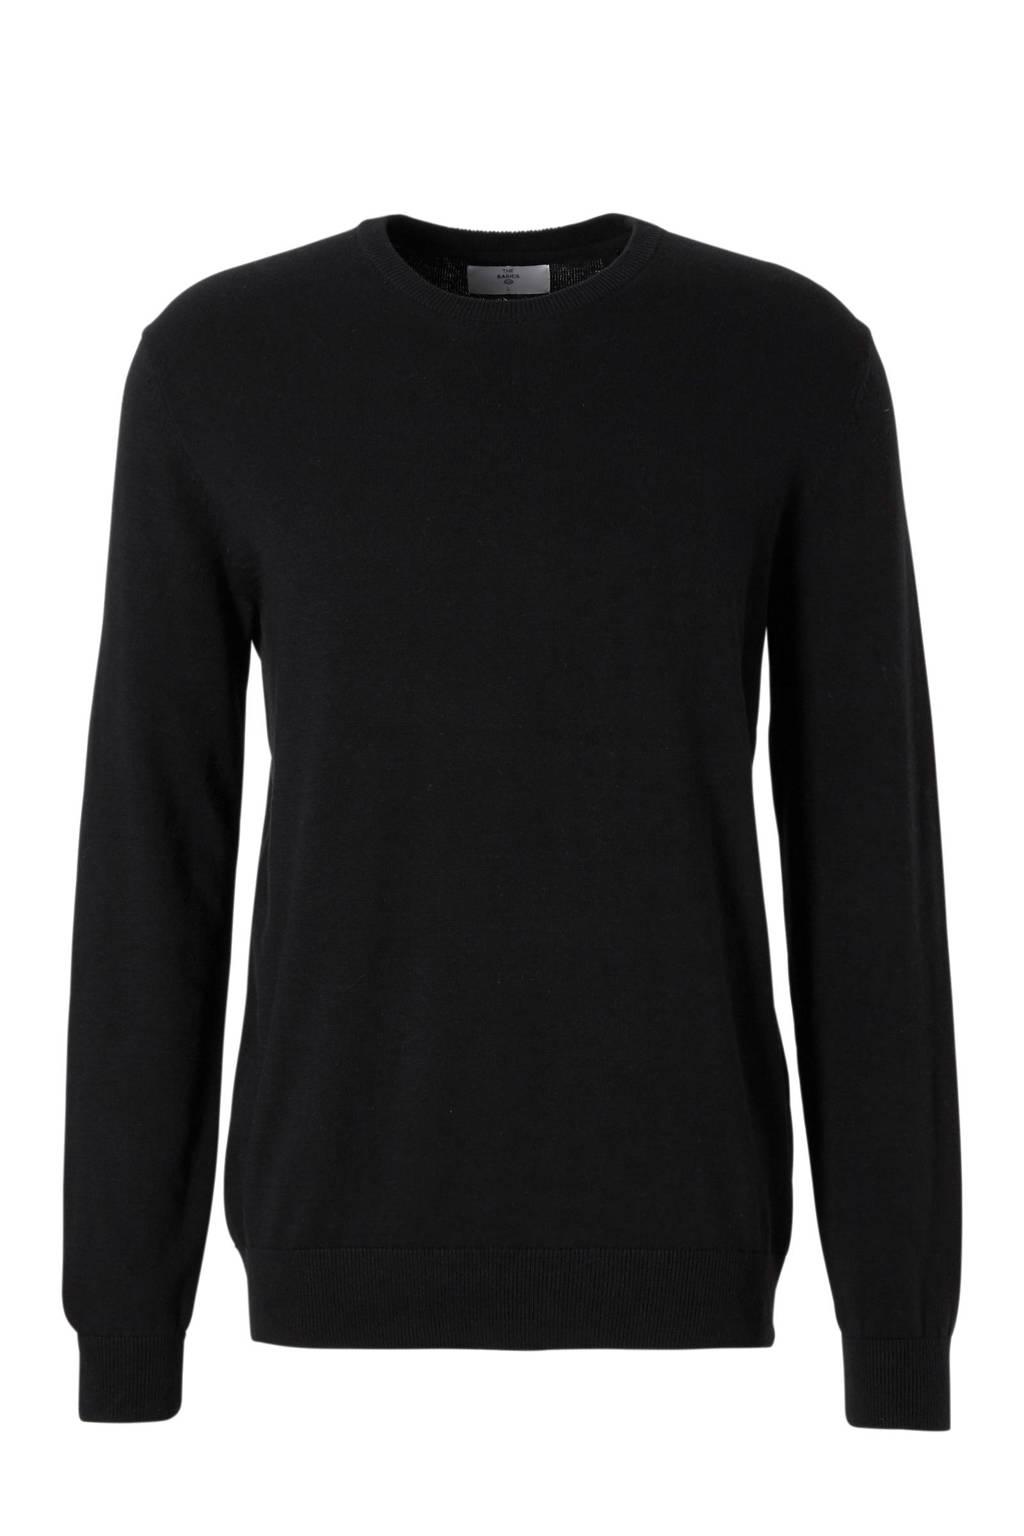 C&A Angelo Litrico trui zwart, Zwart